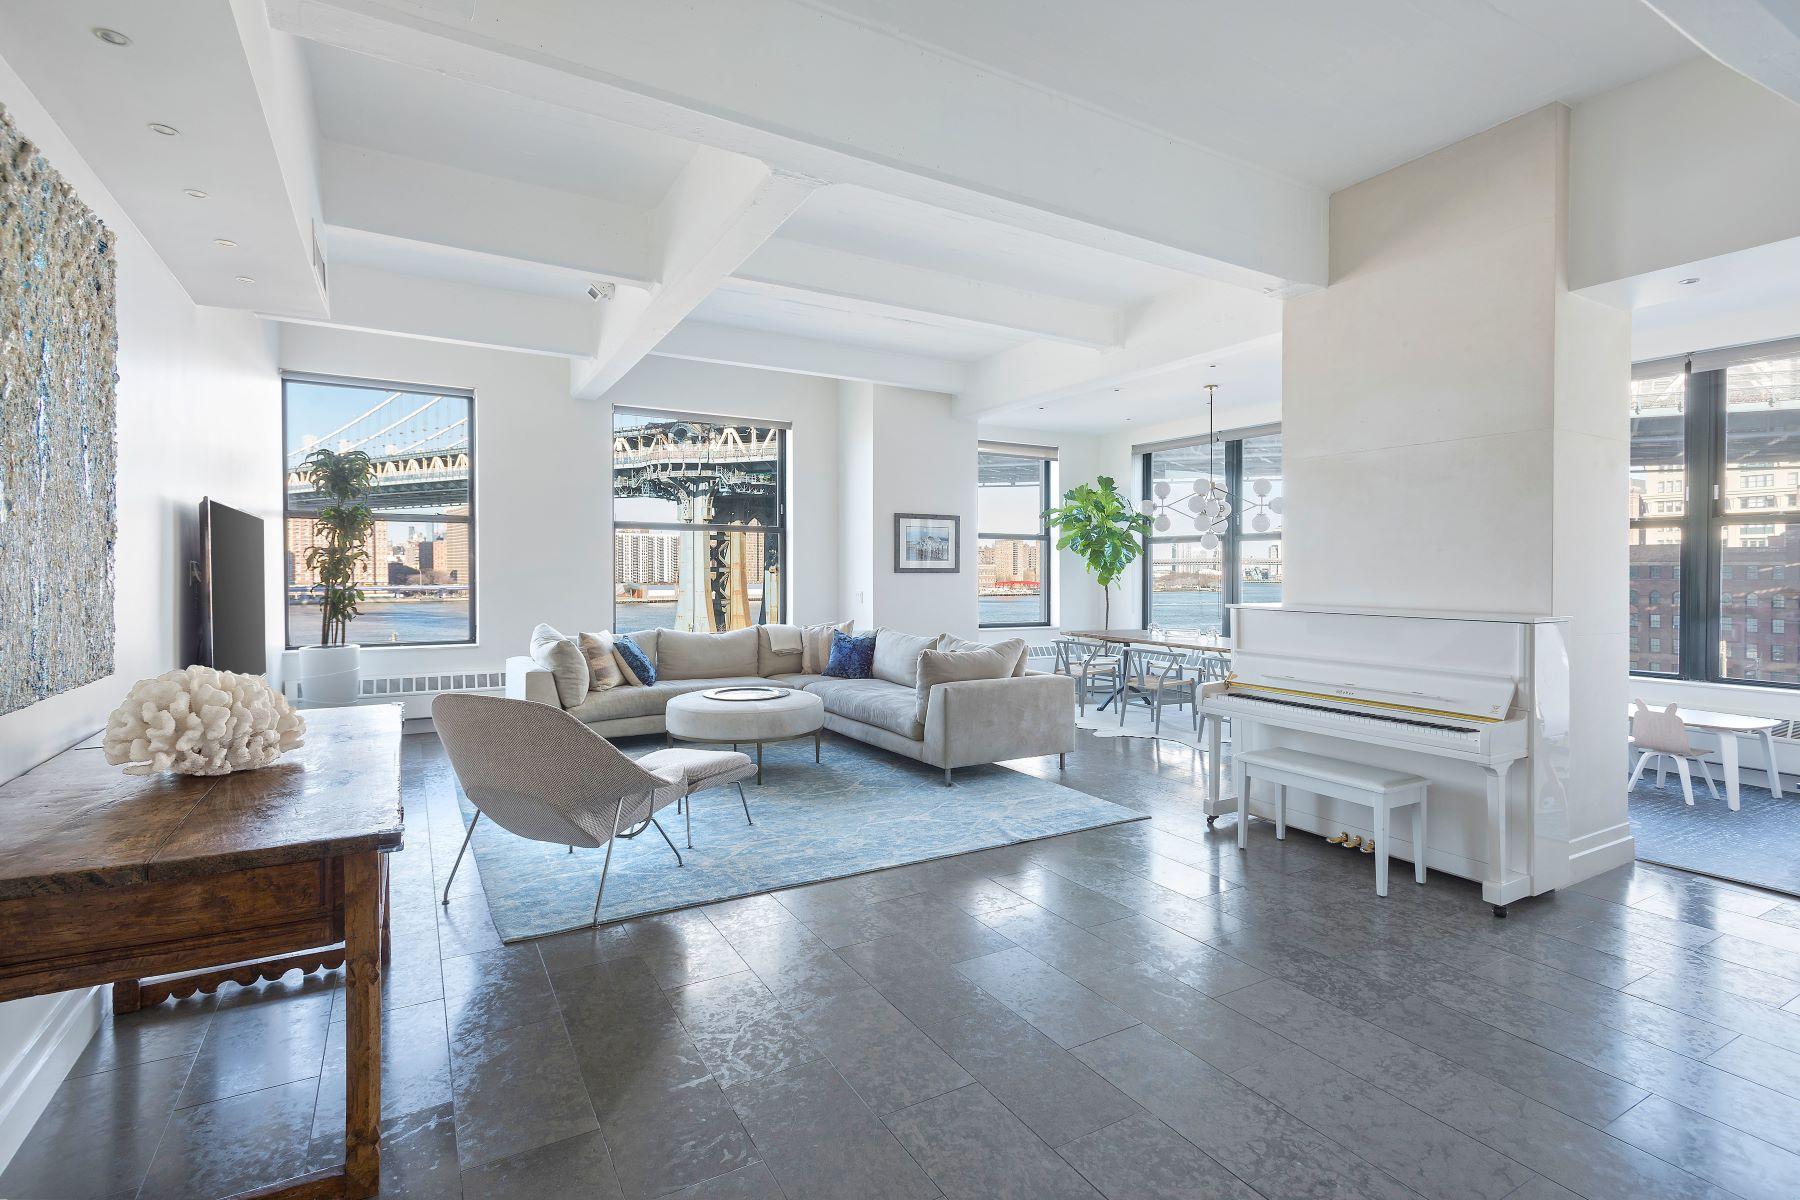 Condominiums 為 出售 在 Spacious, Renovated Waterfront Loft 1 Main Street, Apt 5D, Brooklyn, 纽约 11201 美國